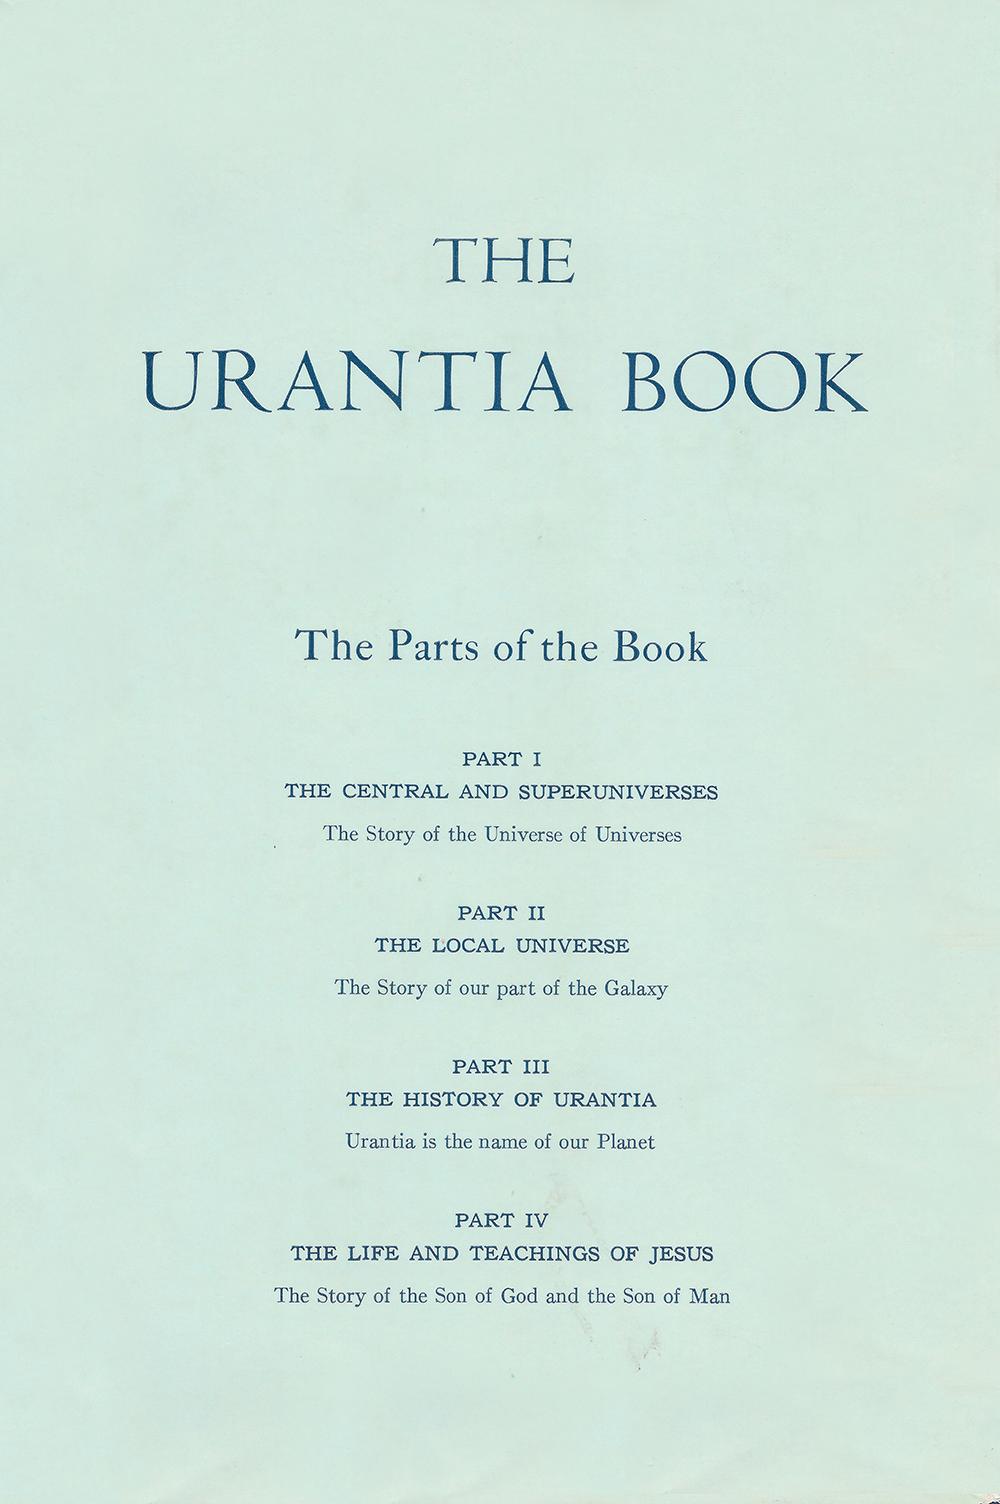 2002 The Urantia Book - Replica of 1955 edition